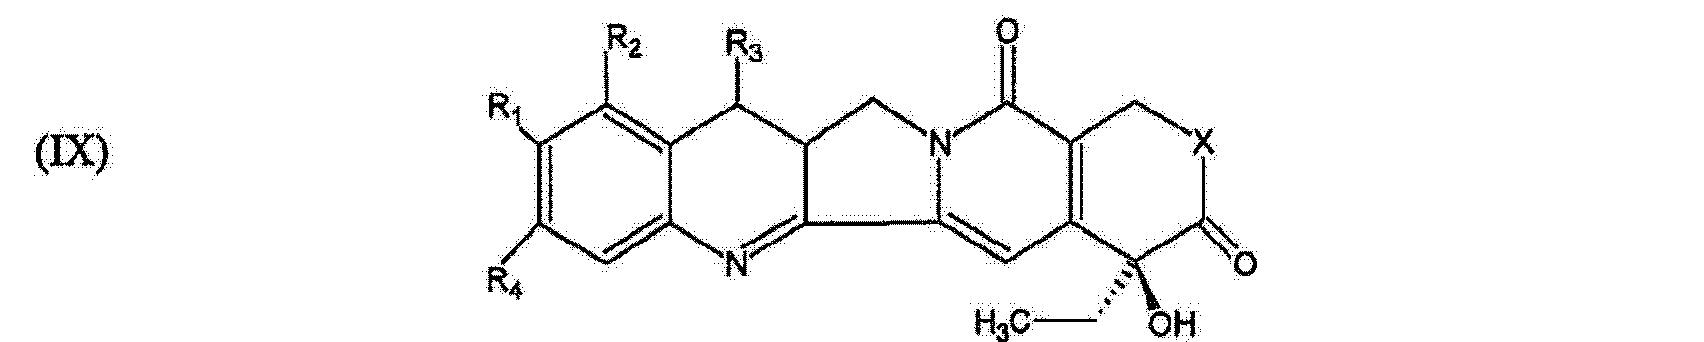 Figure CN104174071AD00662